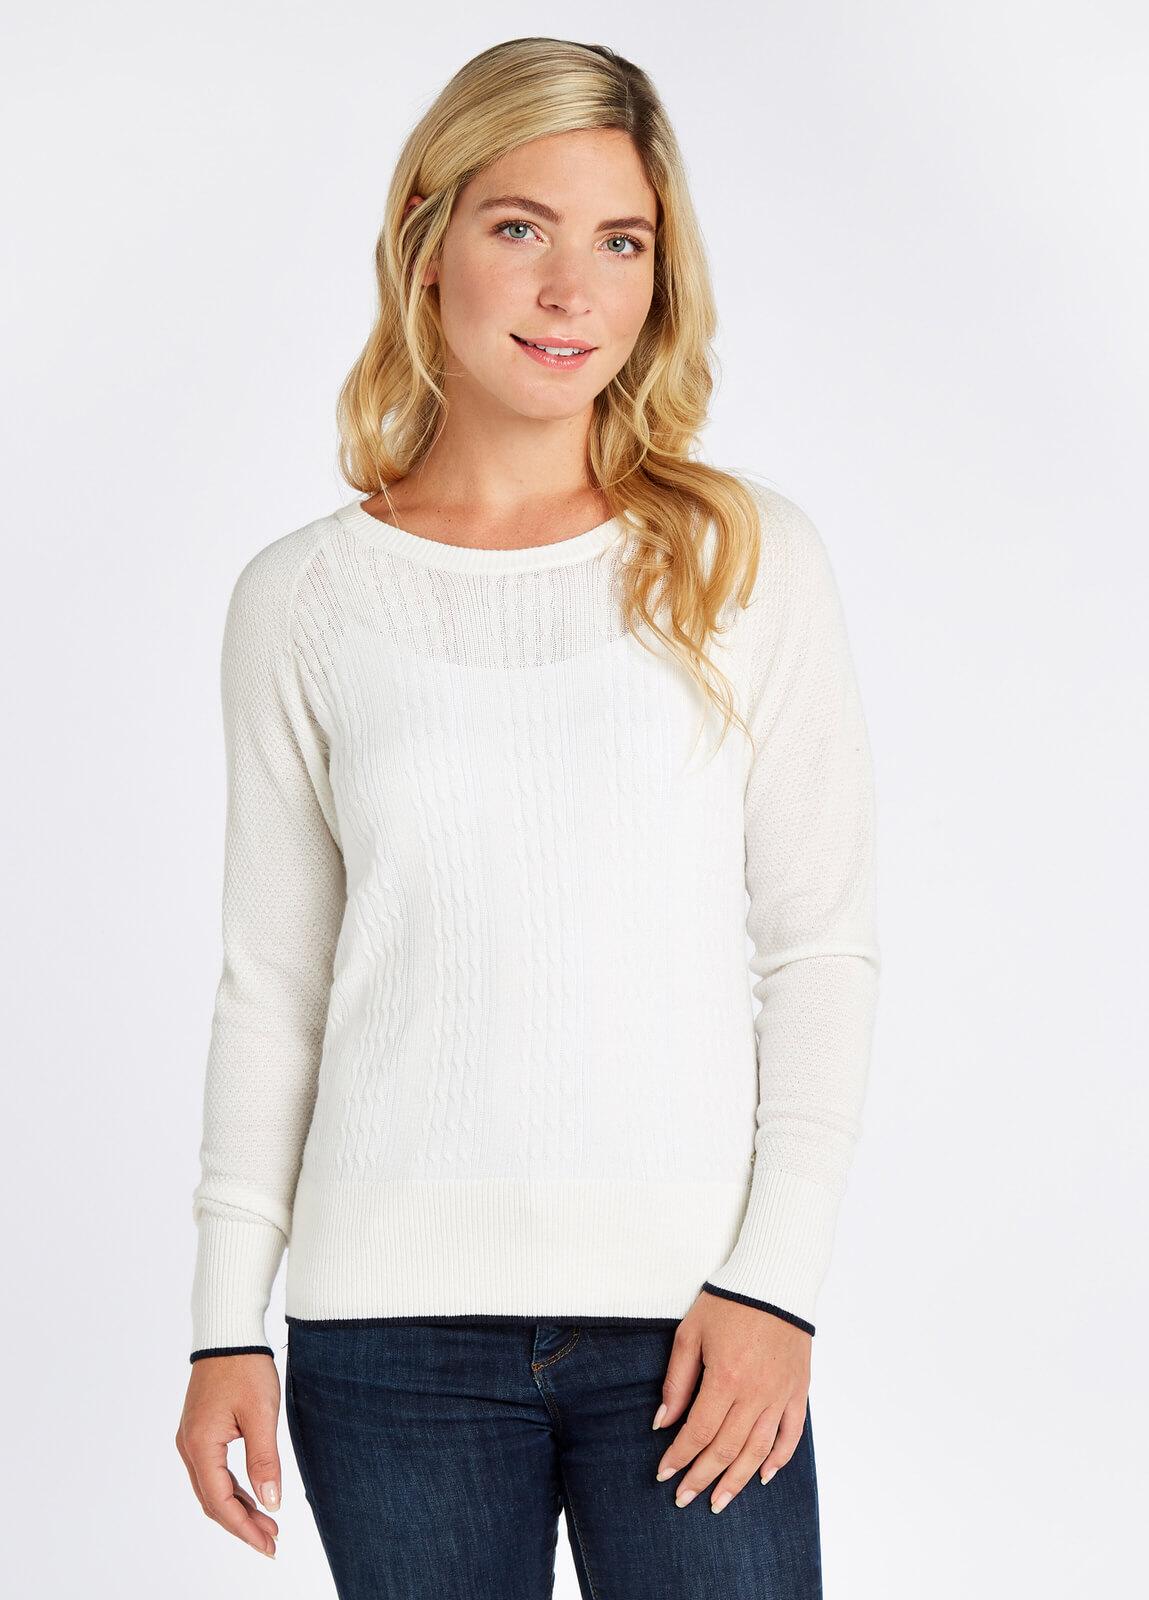 Dubarry_Clifton_Sweater_White_on_model